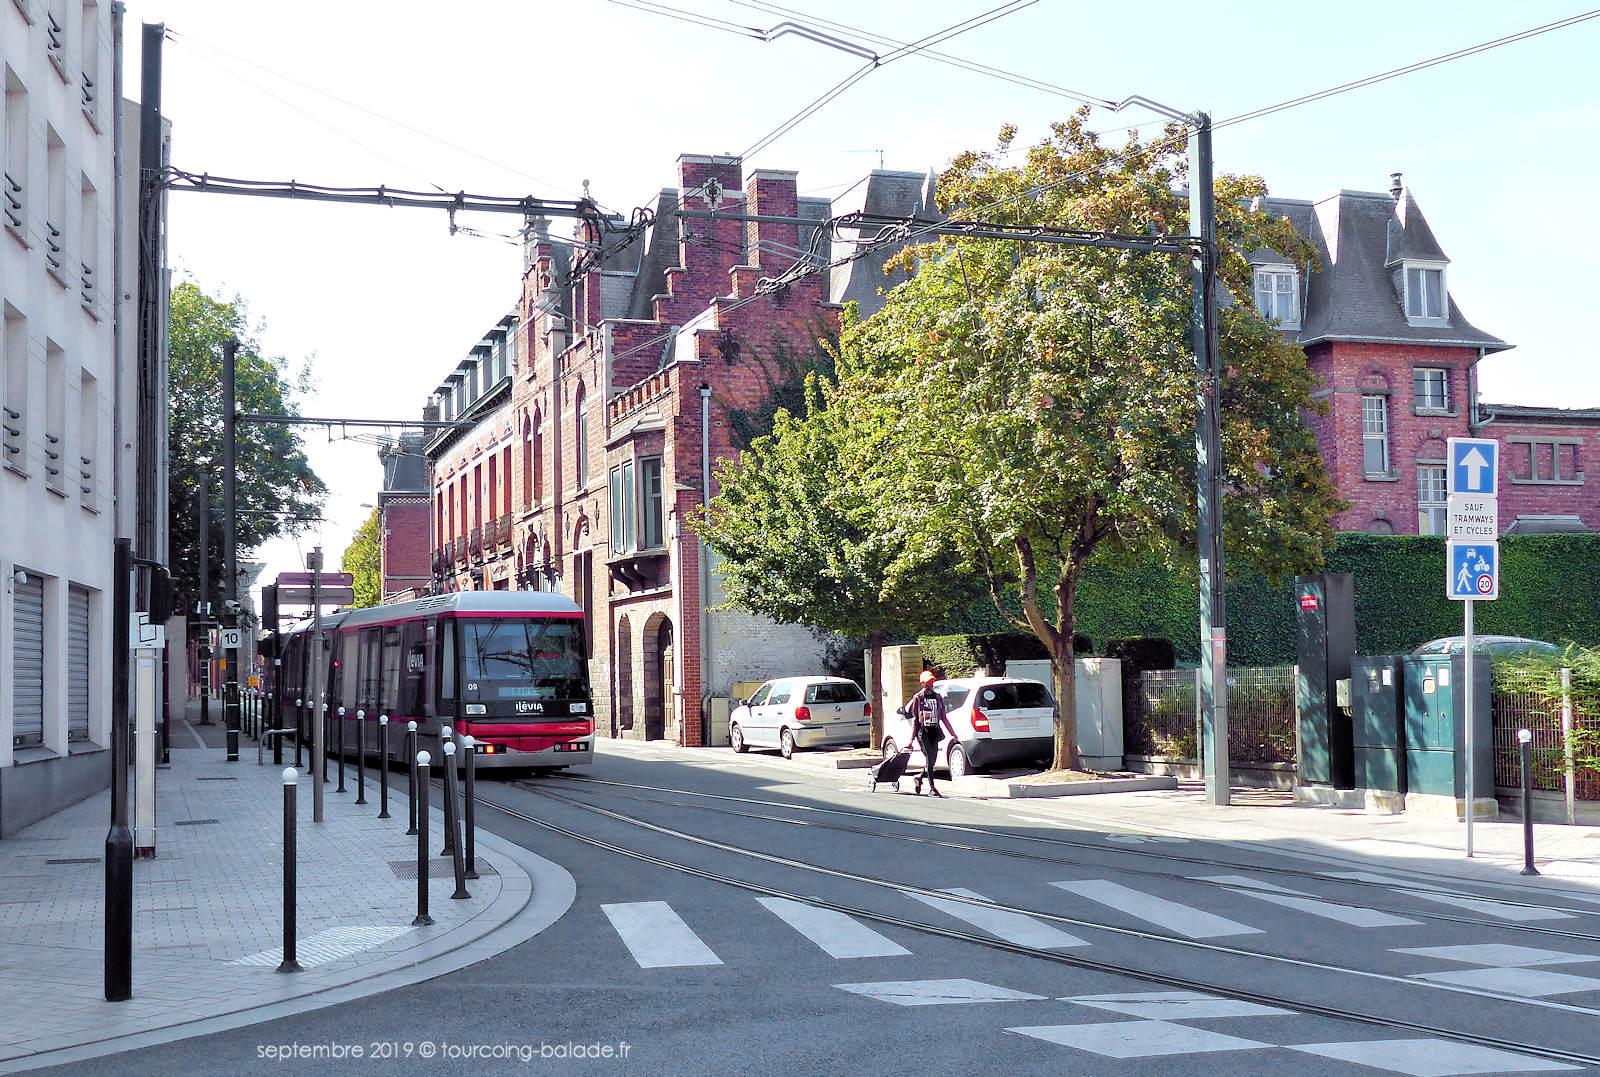 Tourcoing - Carrefour rues Chanzy et Lehoucq.